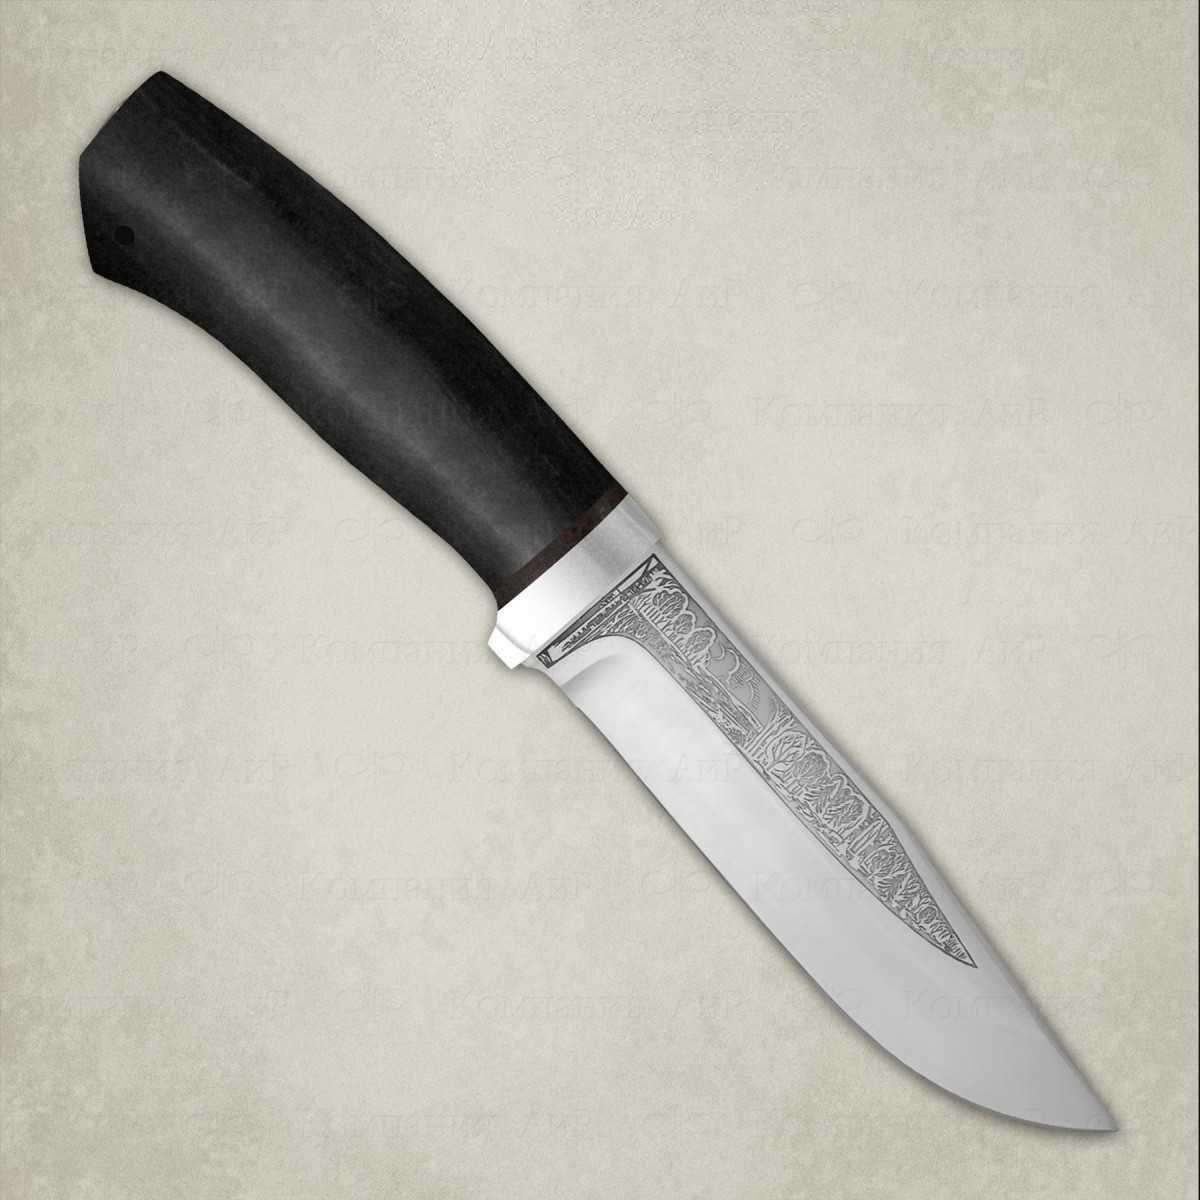 Фото - Нож АиР Турист, сталь Elmax, рукоять граб складной нож wild west сталь elmax рукоять карбон